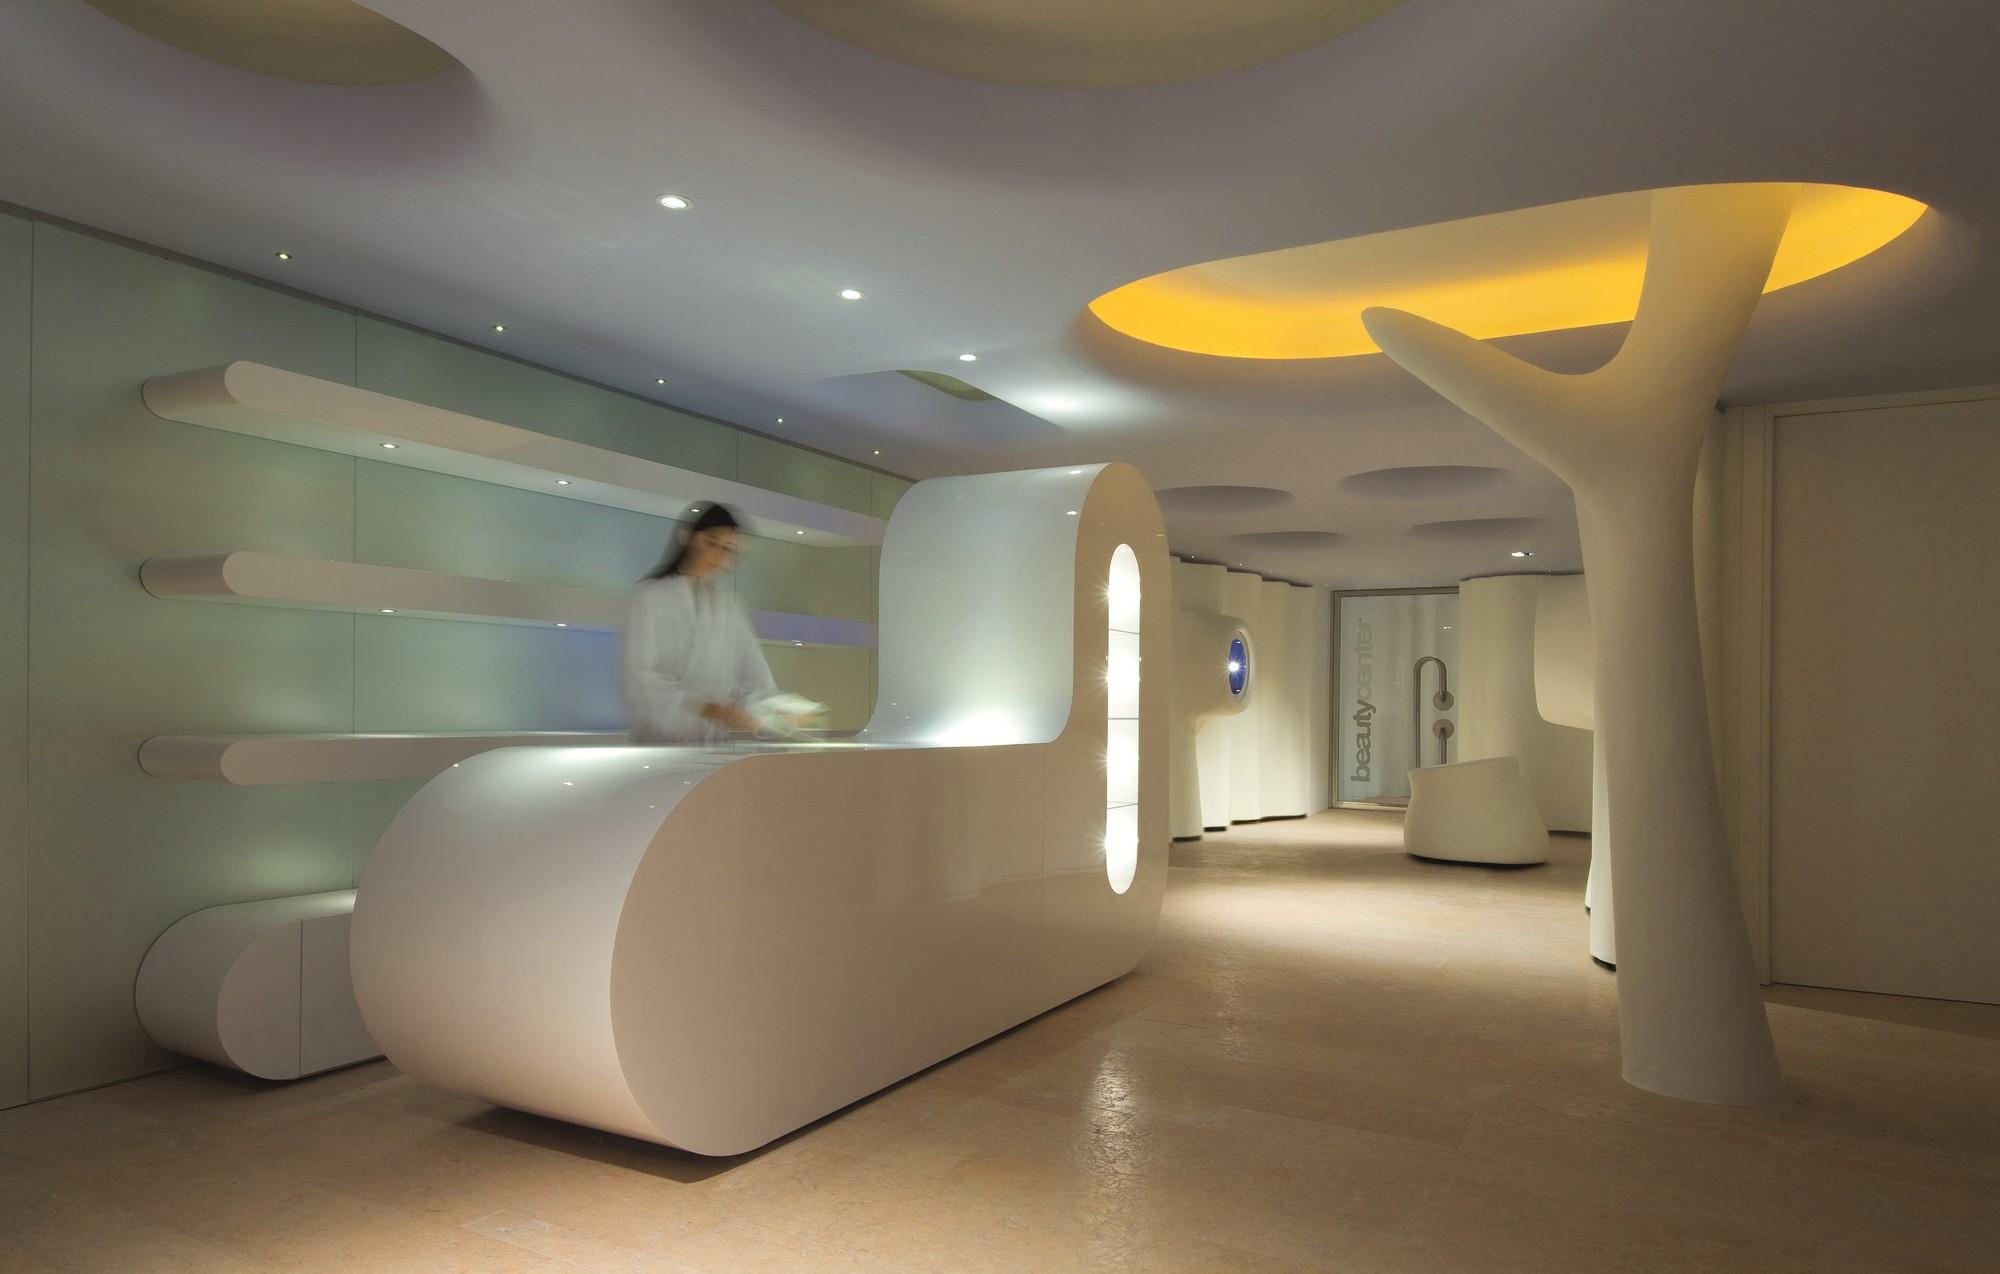 Exedra Nice Hotel Spa / Simone Micheli, © Jürgen Eheim